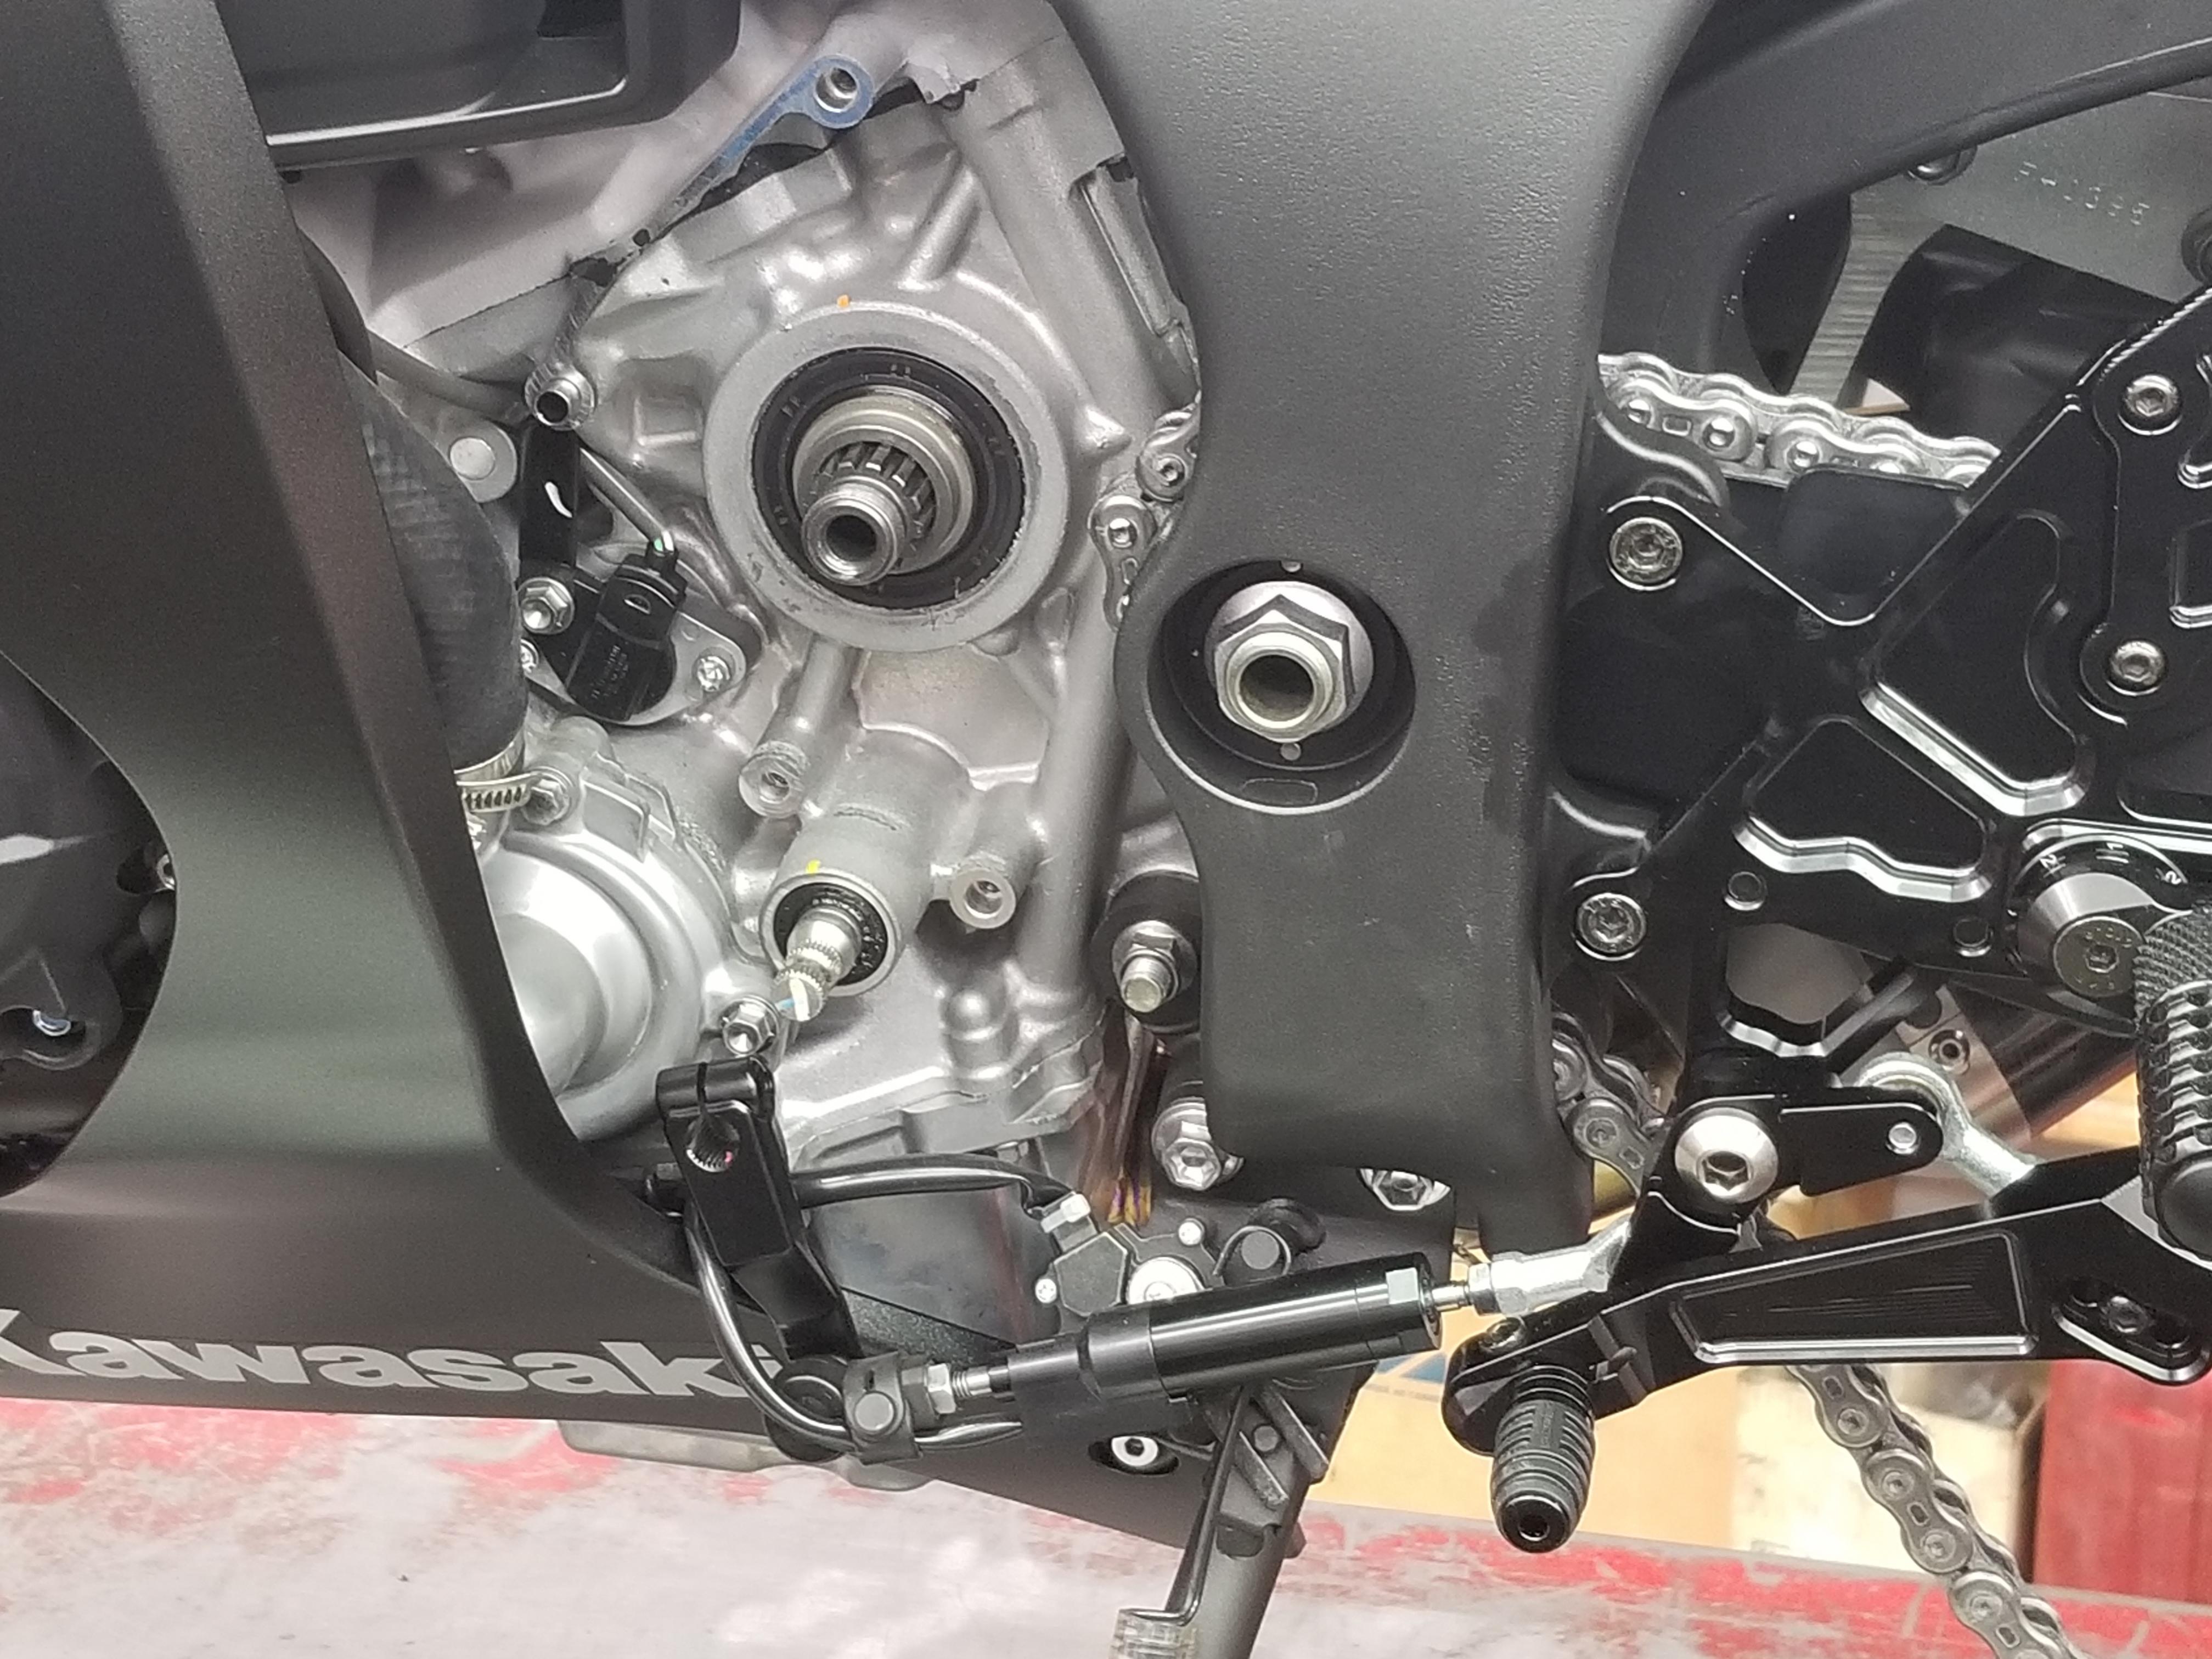 Gen 5: 2016- GEN 5 ZX-10R Lineup Recalled- Gears Might Break